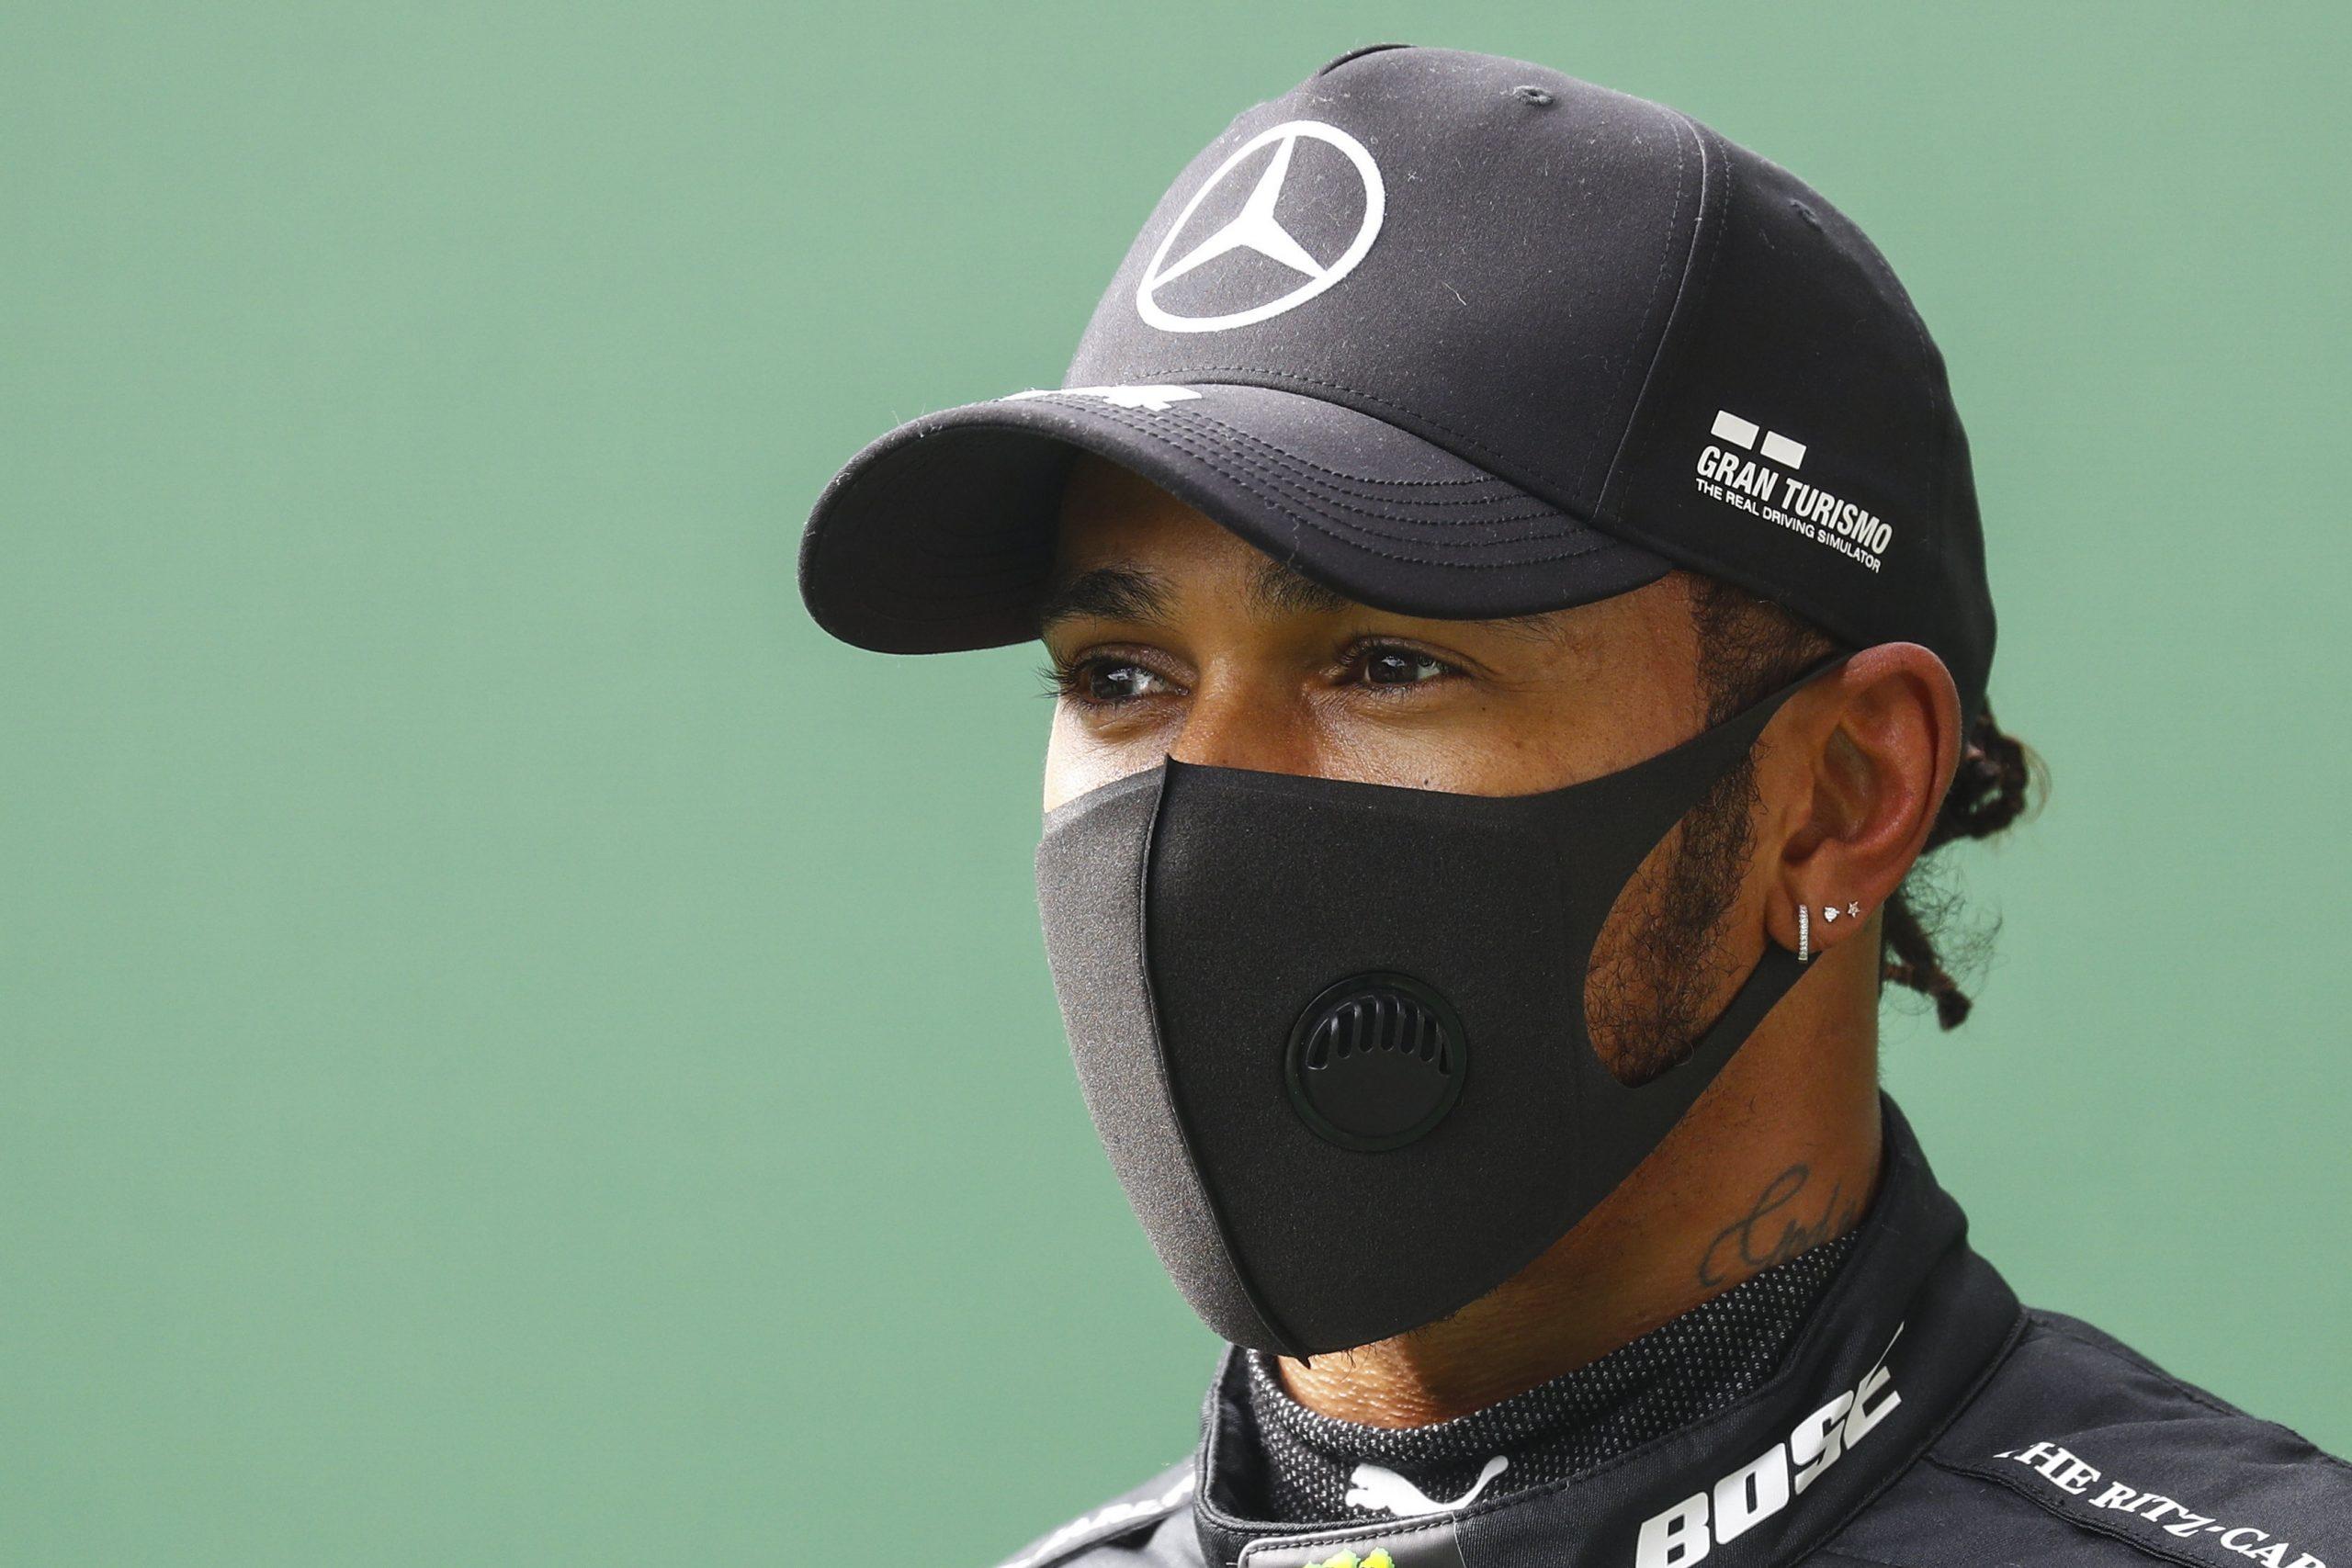 Lewis Hamilton Raises Voice Against Hungary's Controversial 'Anti-LGBTQ+ Law'